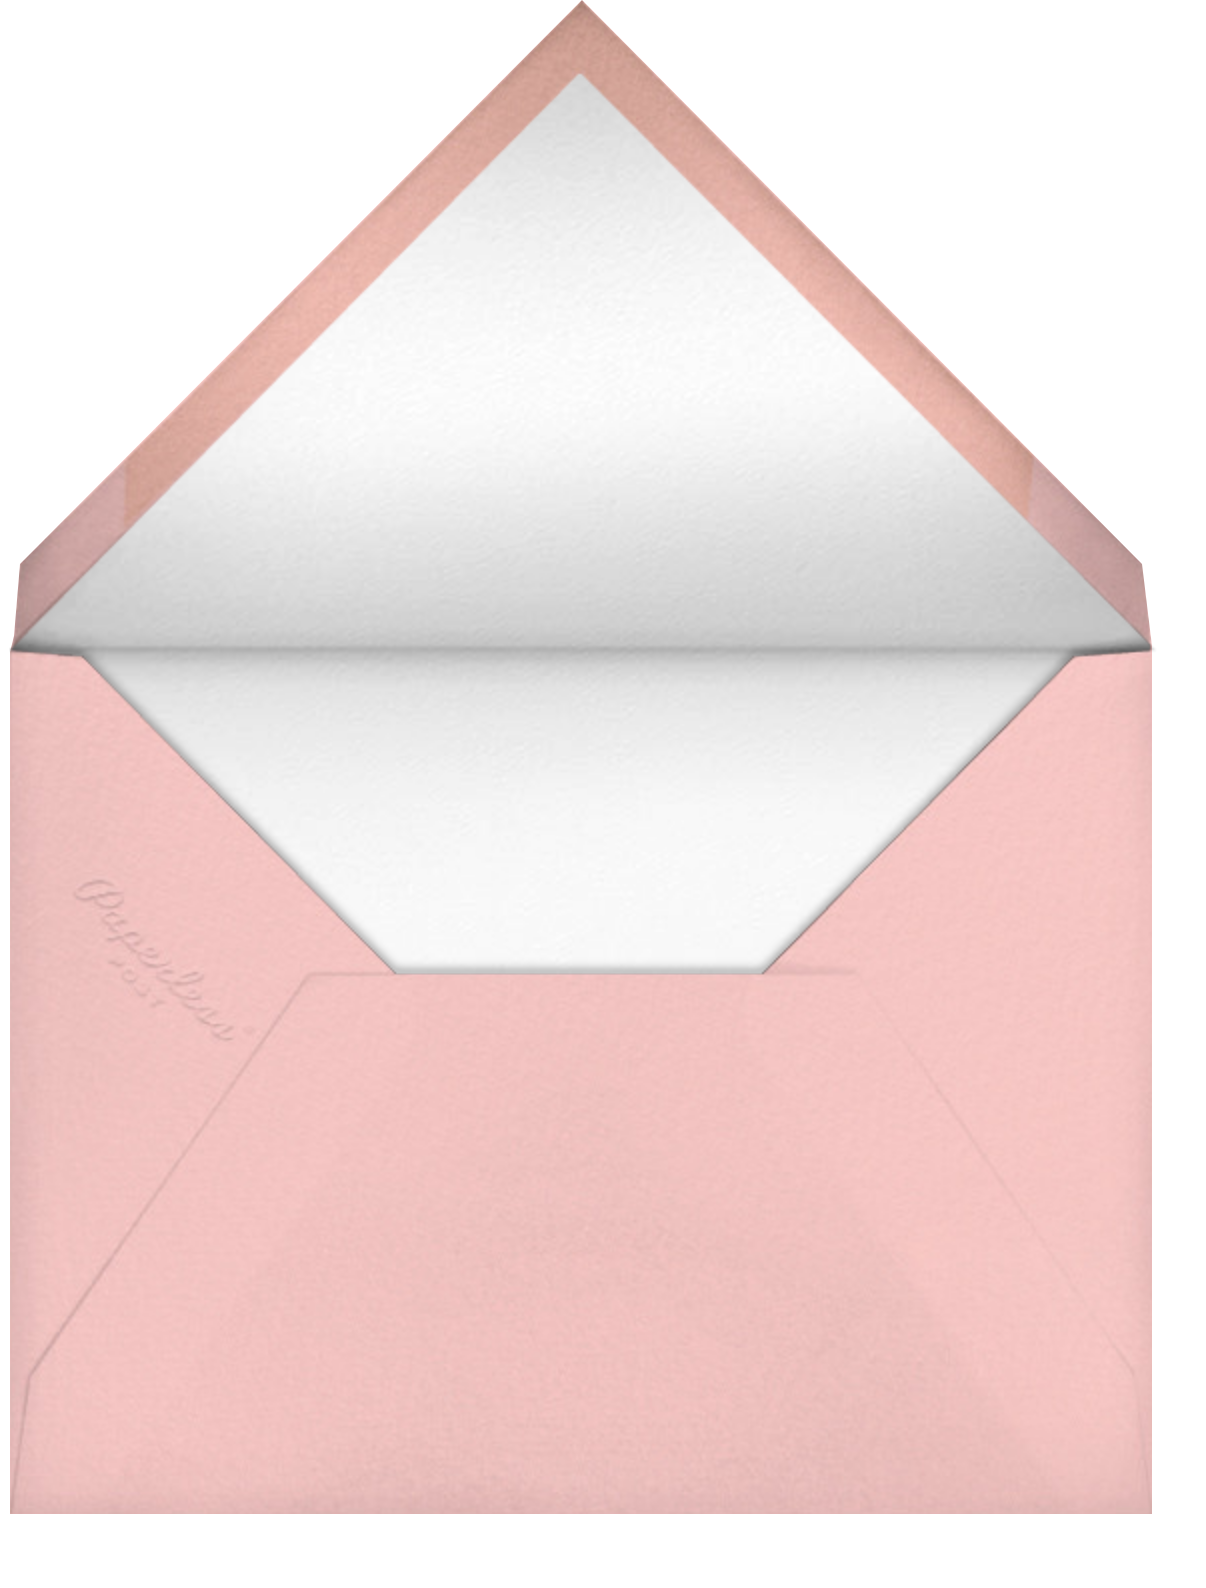 Mercedes - Tea Rose - Paperless Post - Photo  - envelope back